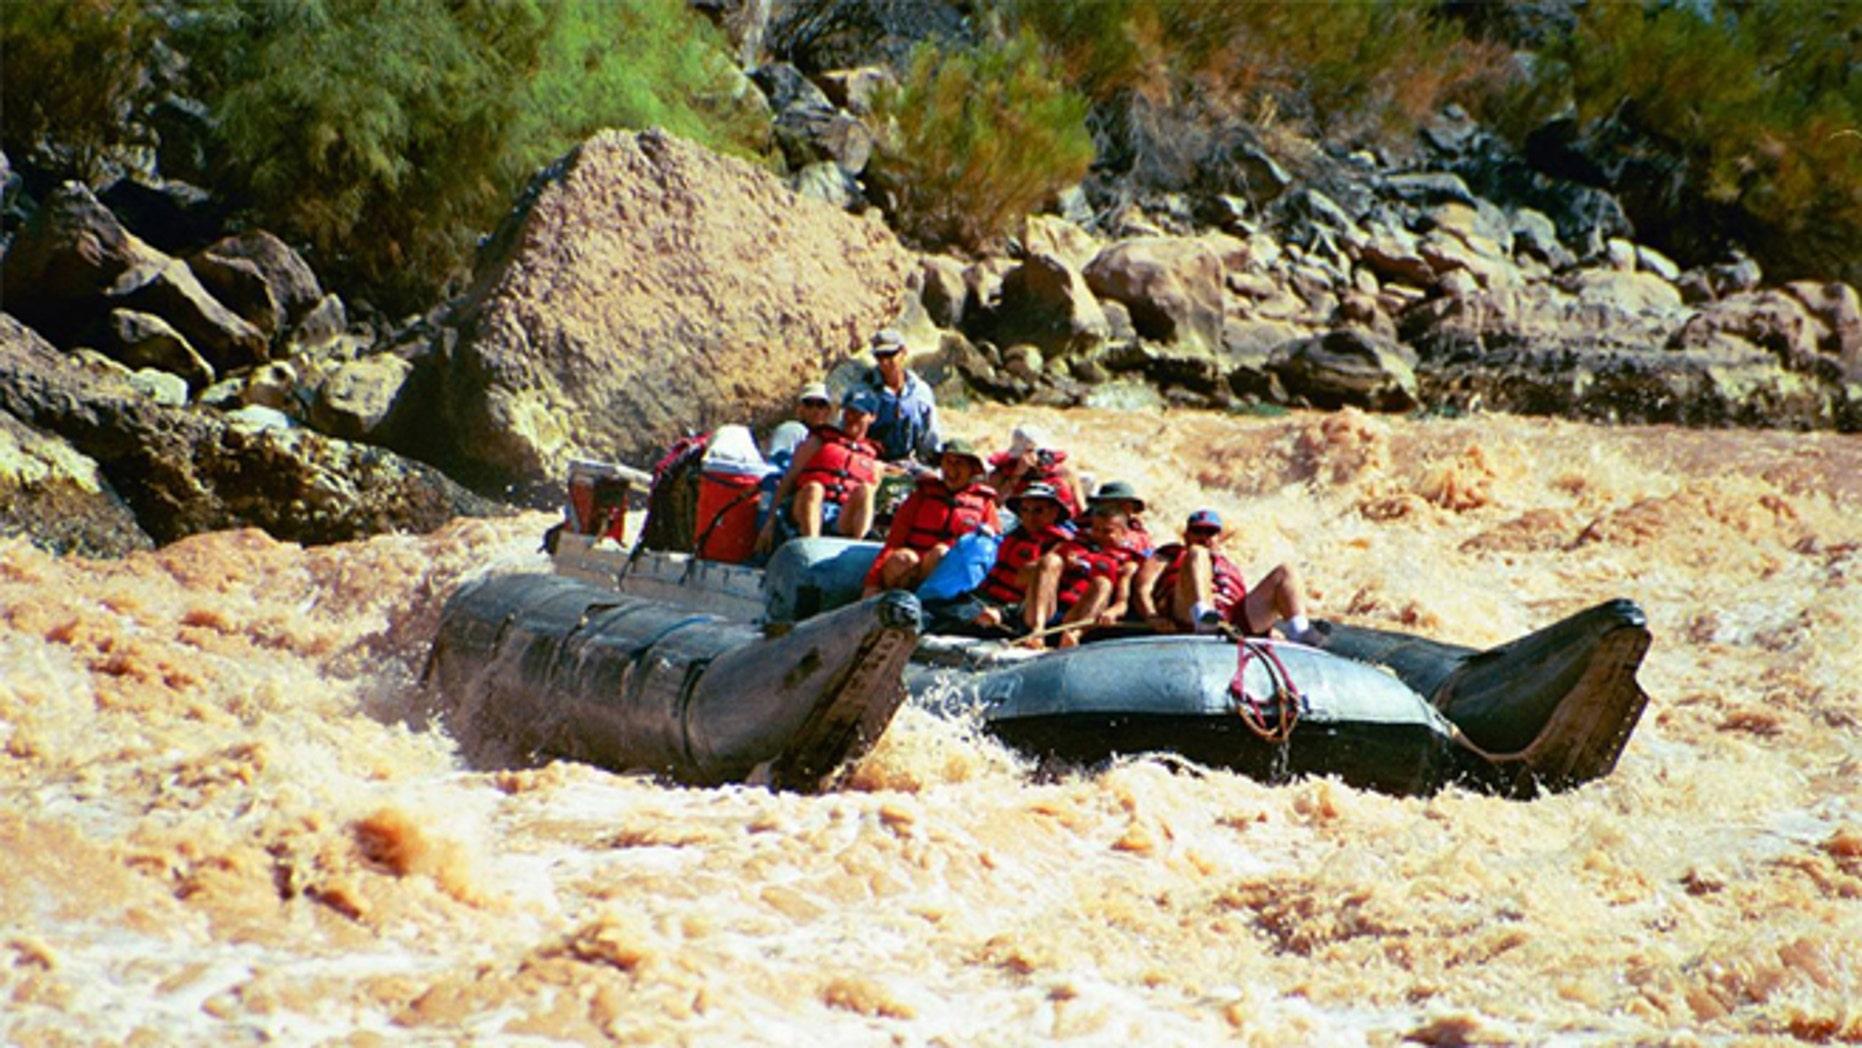 Visitors riding a pontoon raft through rapids in Grand Canyon National Park, Ariz.